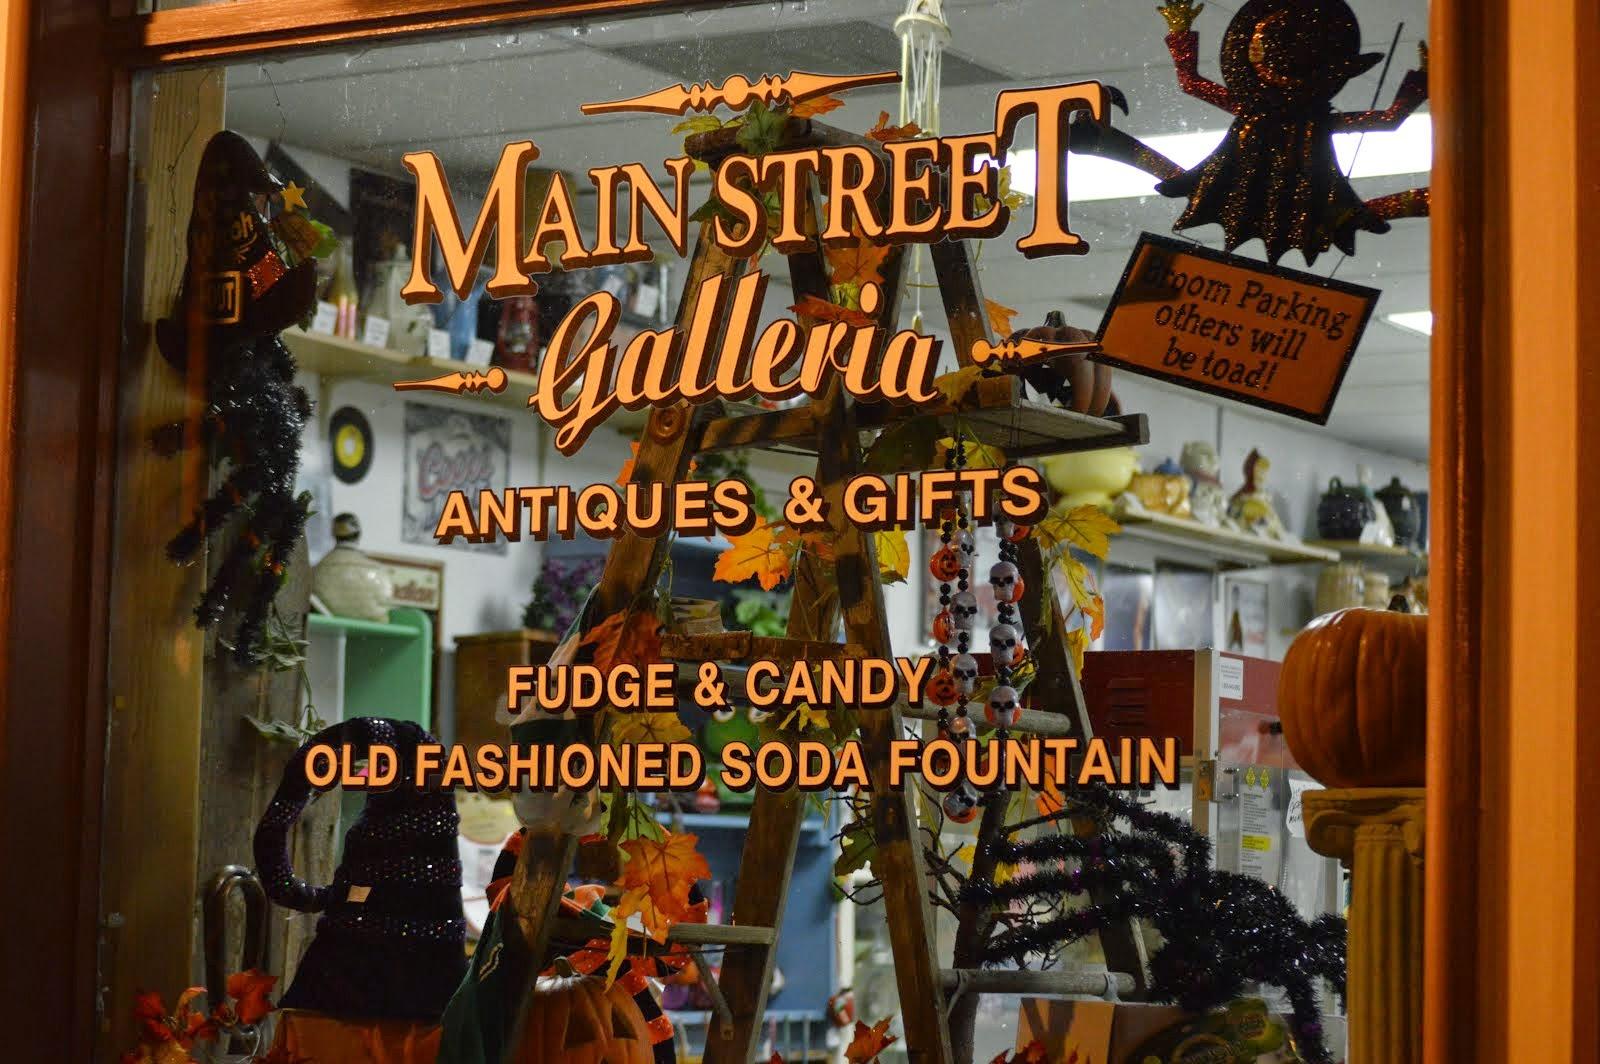 Main Street Galleria